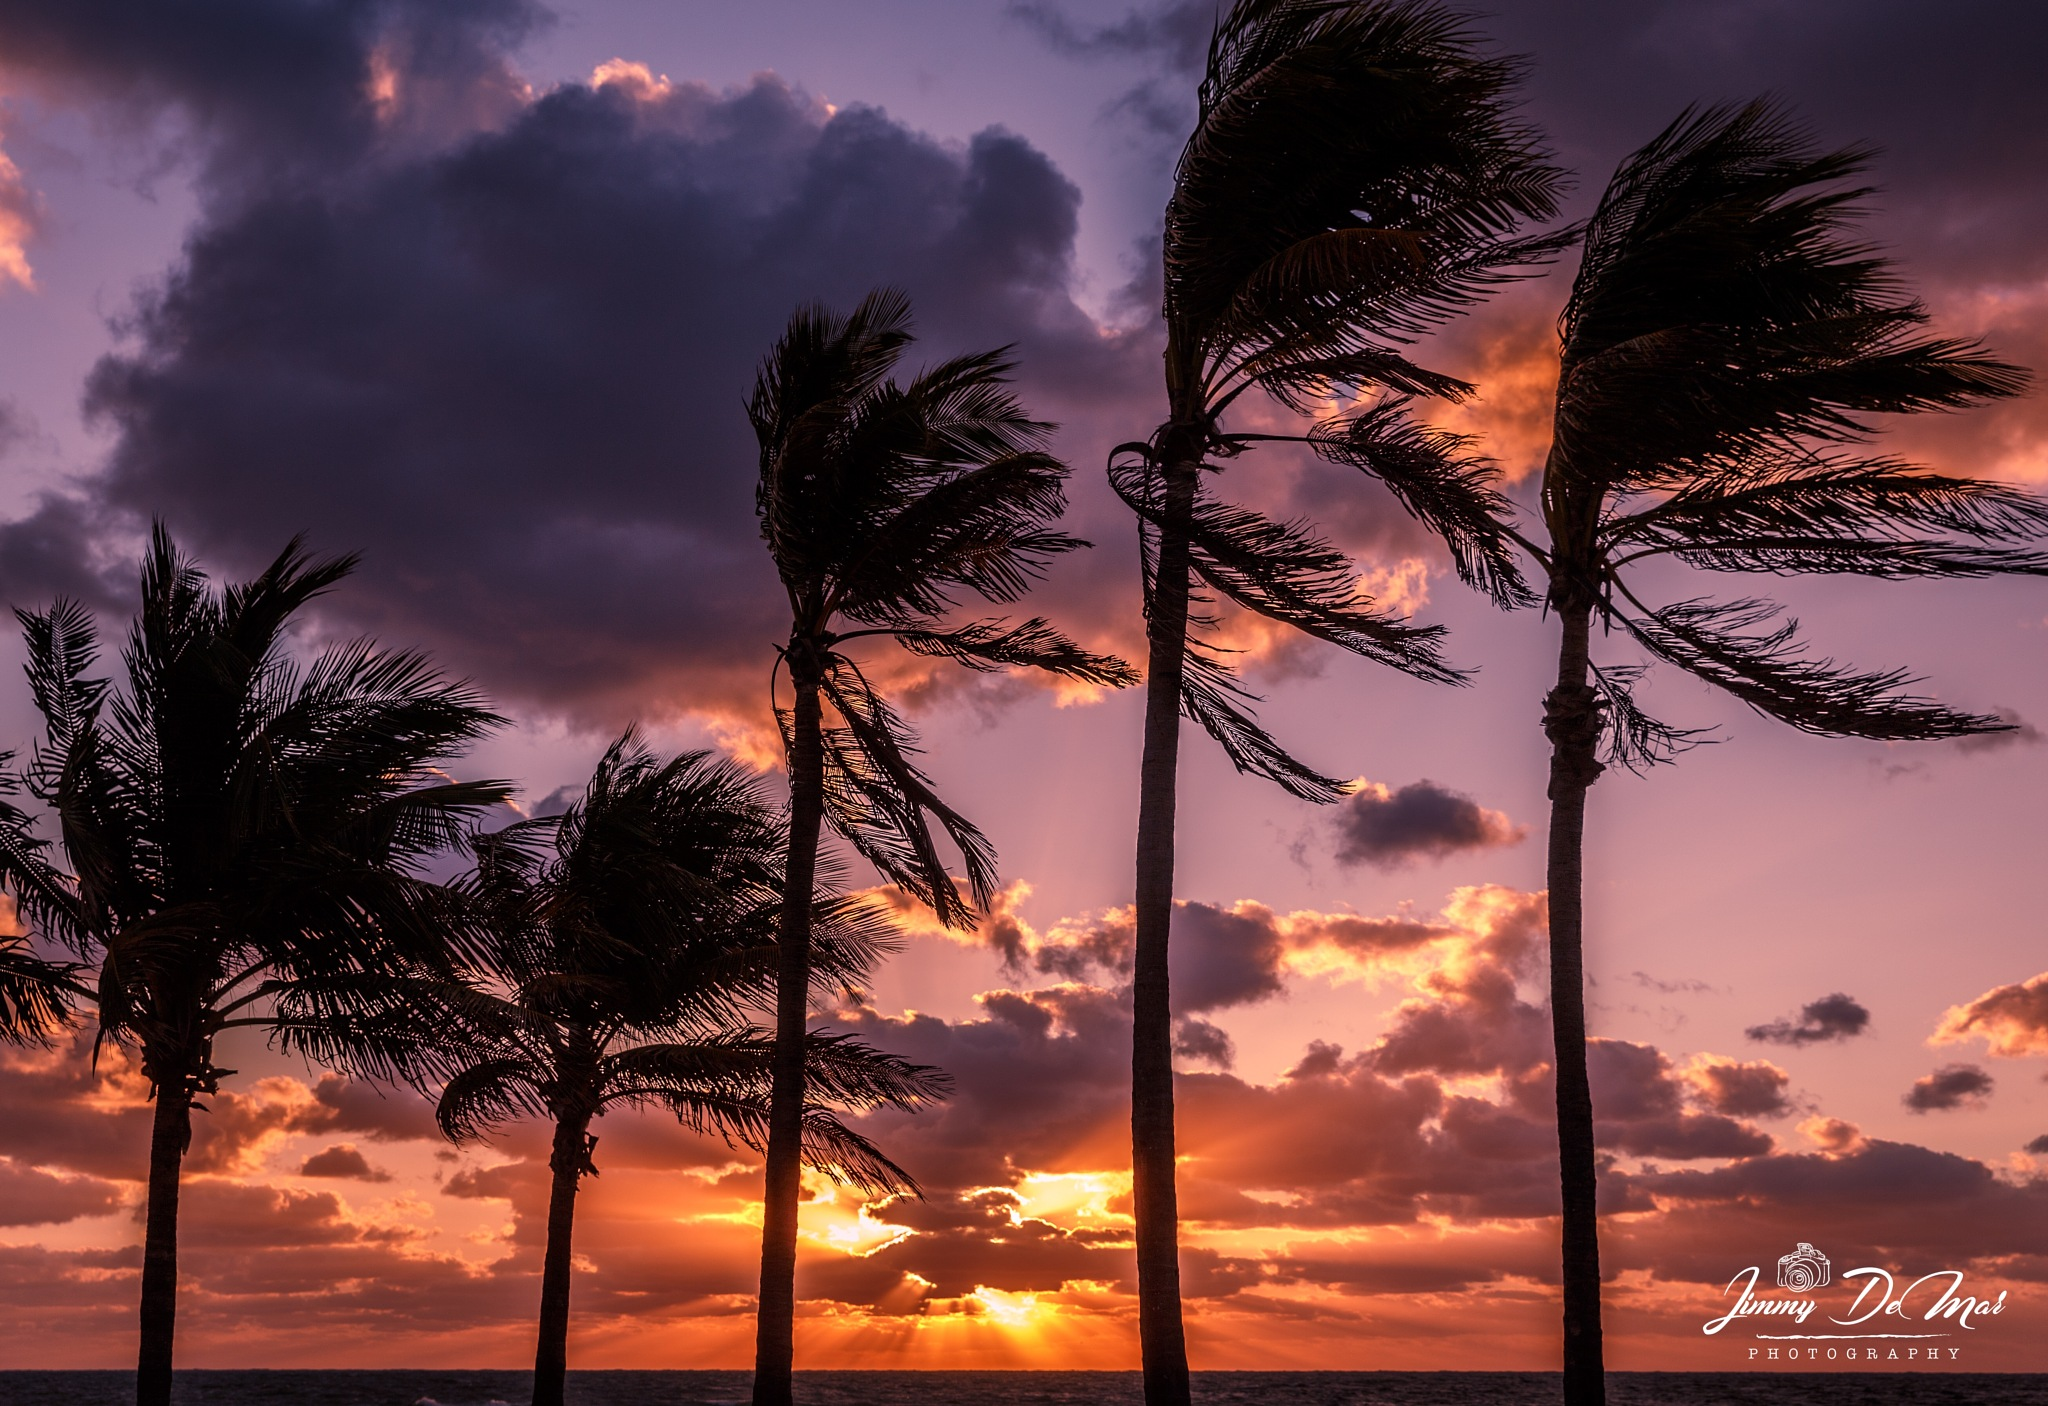 A South Florida Sunrise by Jimmy DeMar